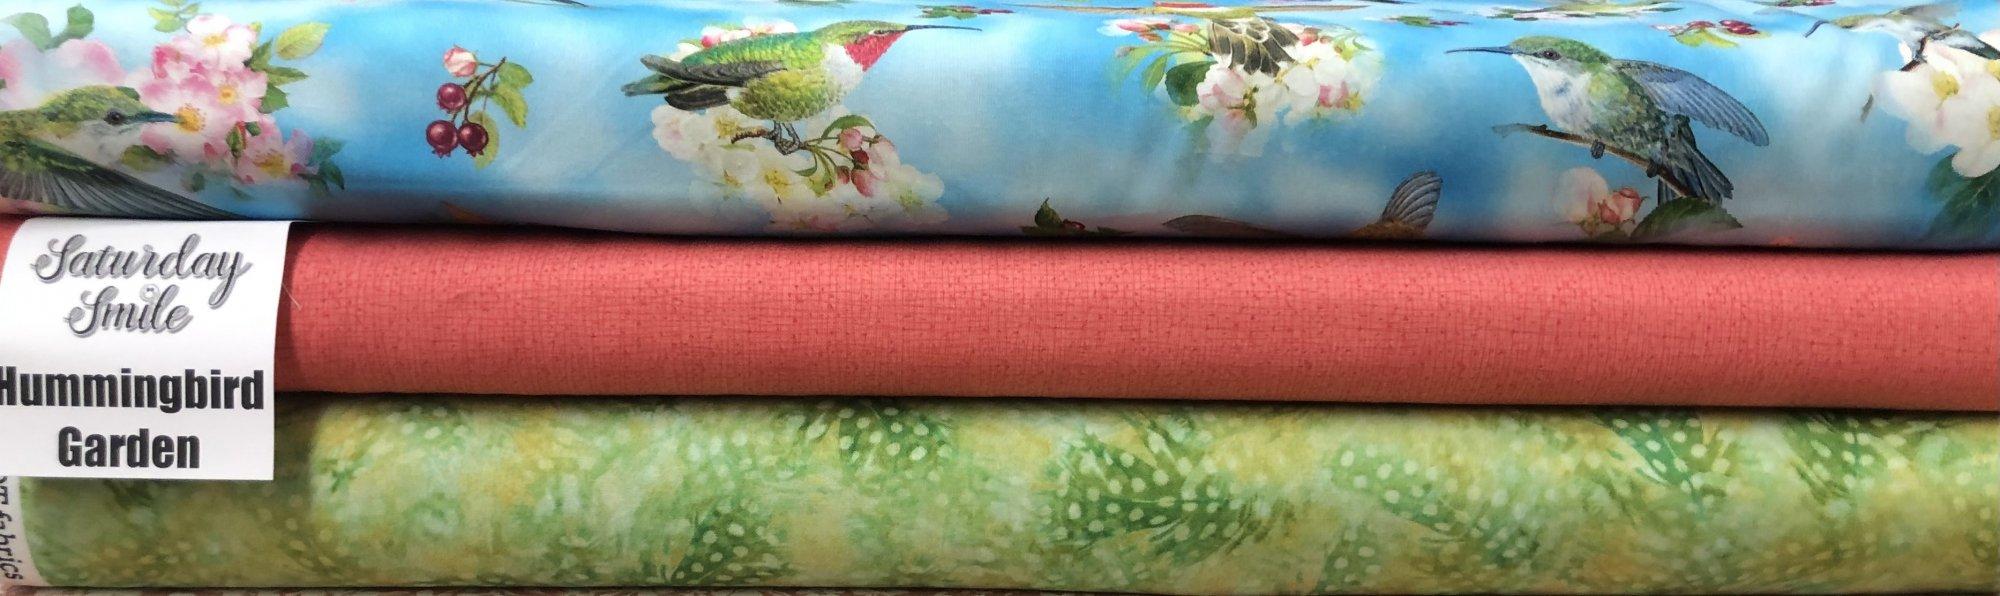 Hummingbird Garden 3-Yard Quilt Kit